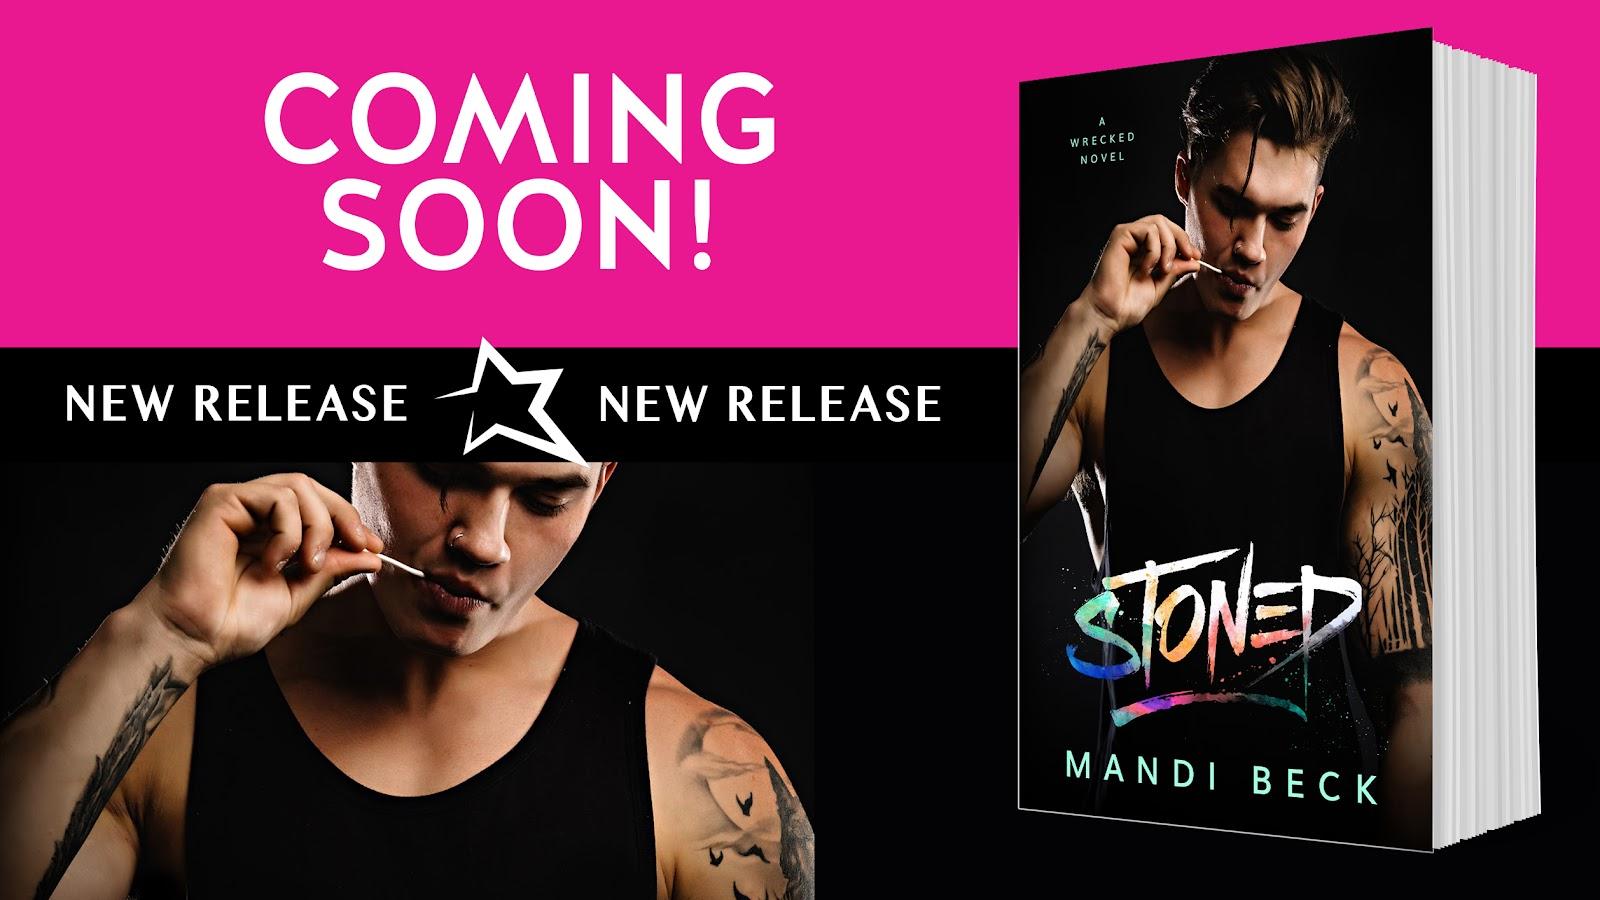 STONED_COMING_SOON.jpg